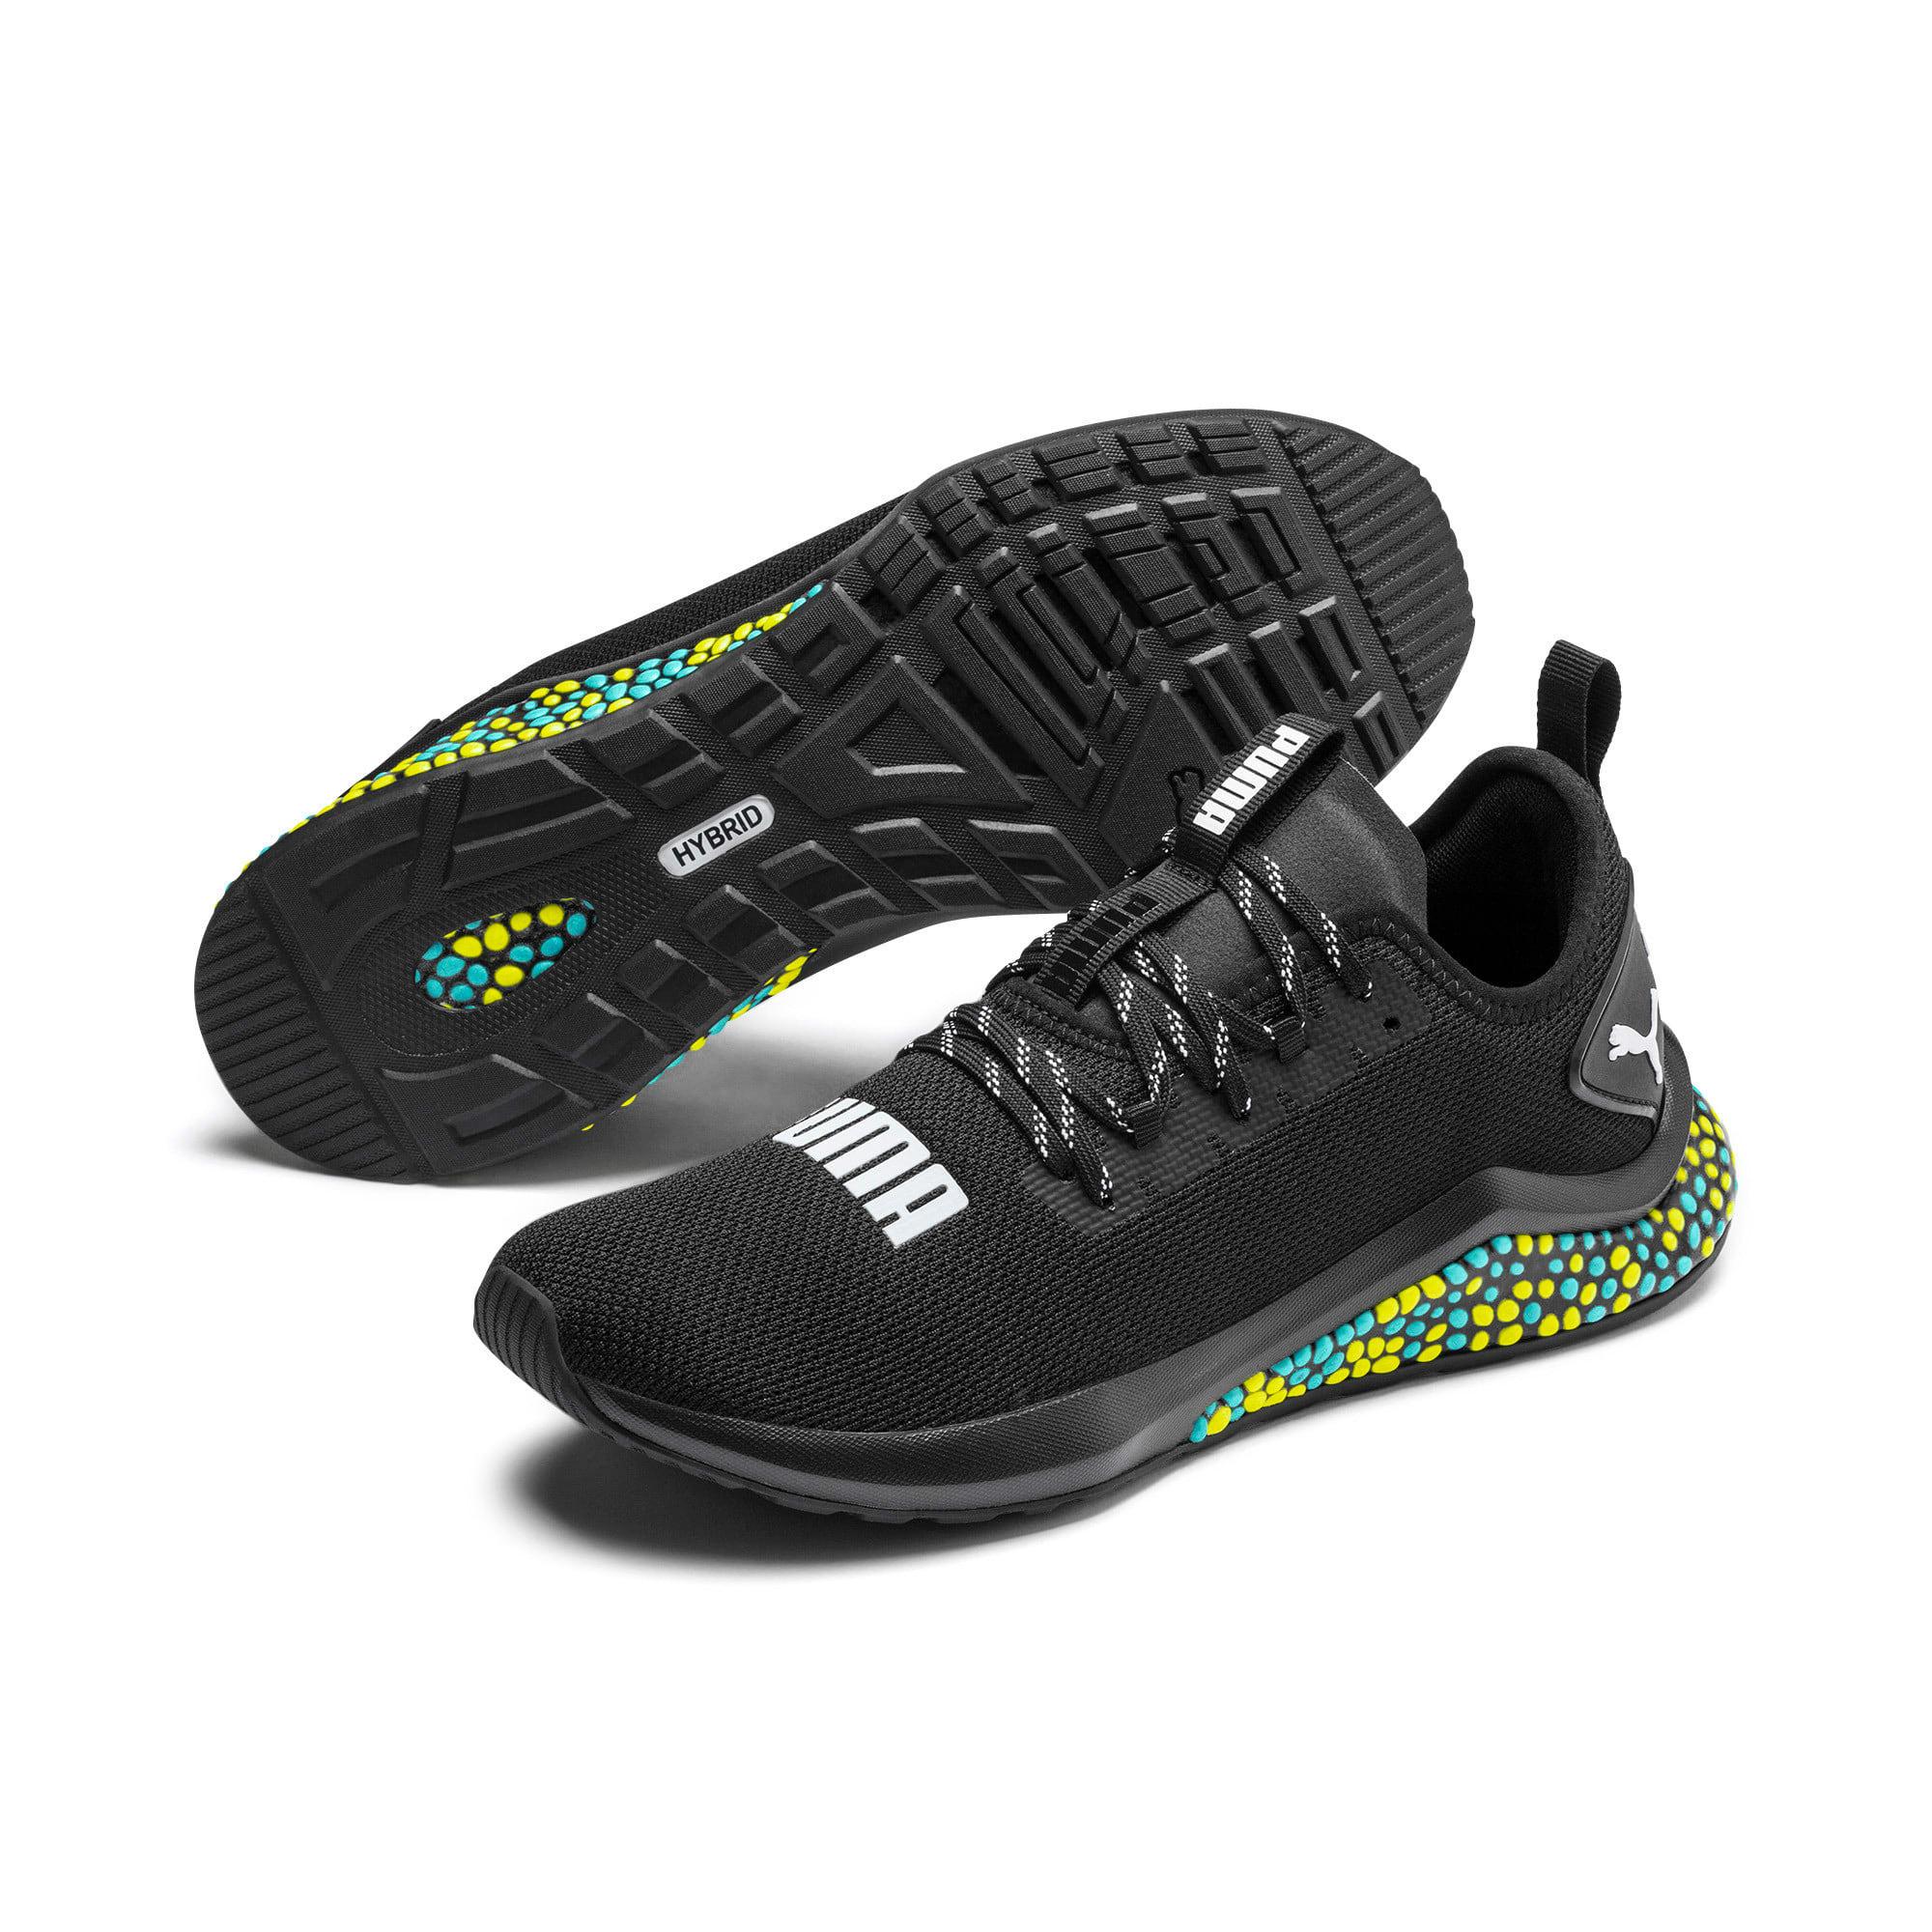 Thumbnail 3 of HYBRID NX Men's Running Shoes, Puma Black-Yellow Alert-Blue, medium